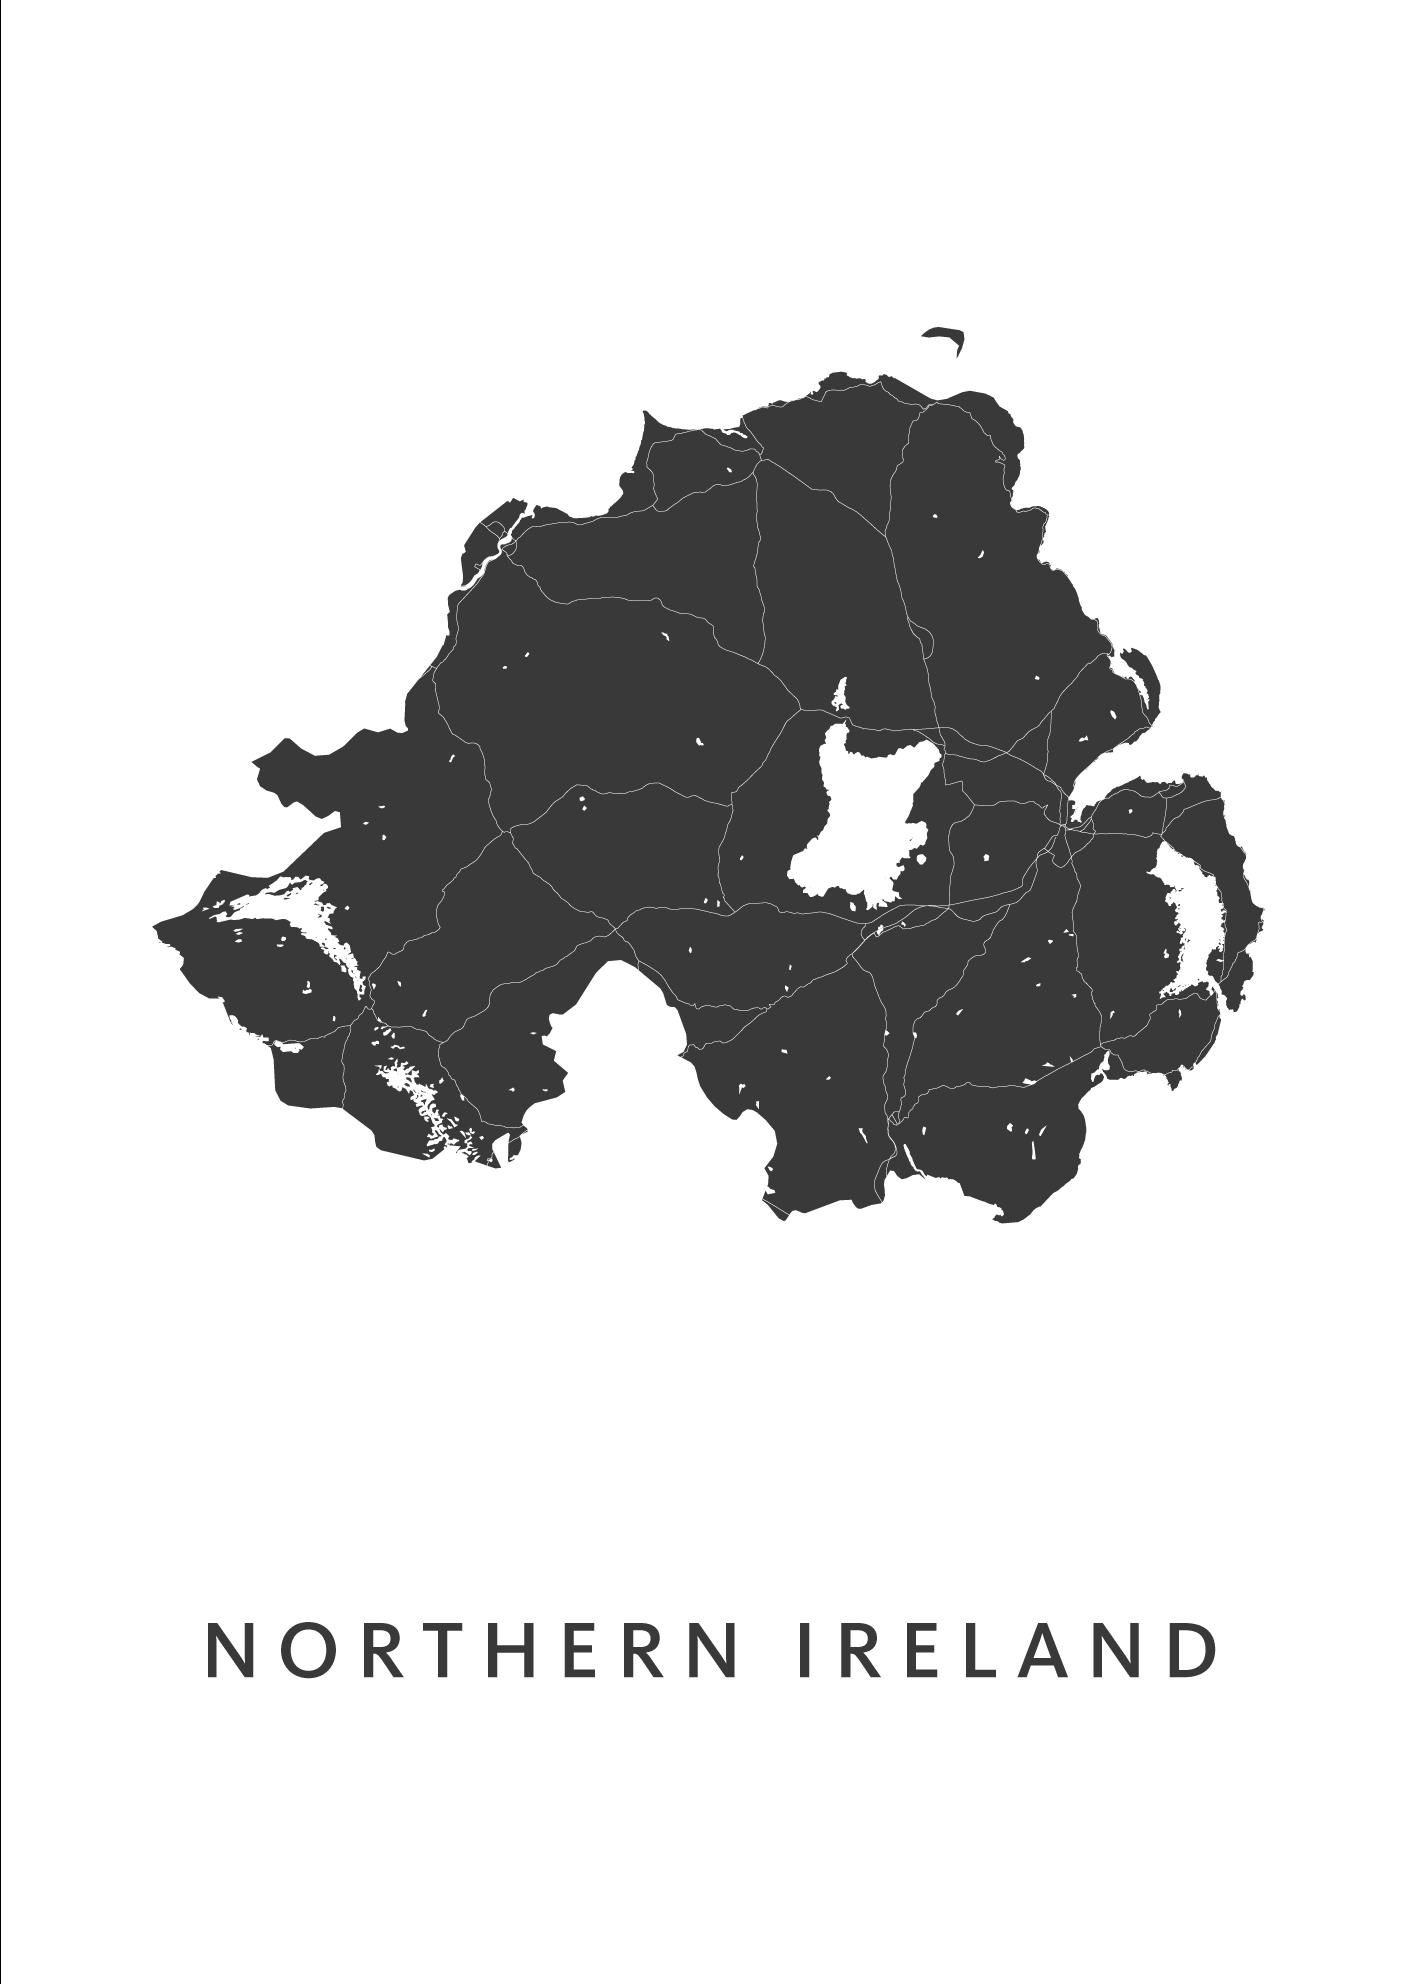 Northern Ireland Country Map stadskaart poster